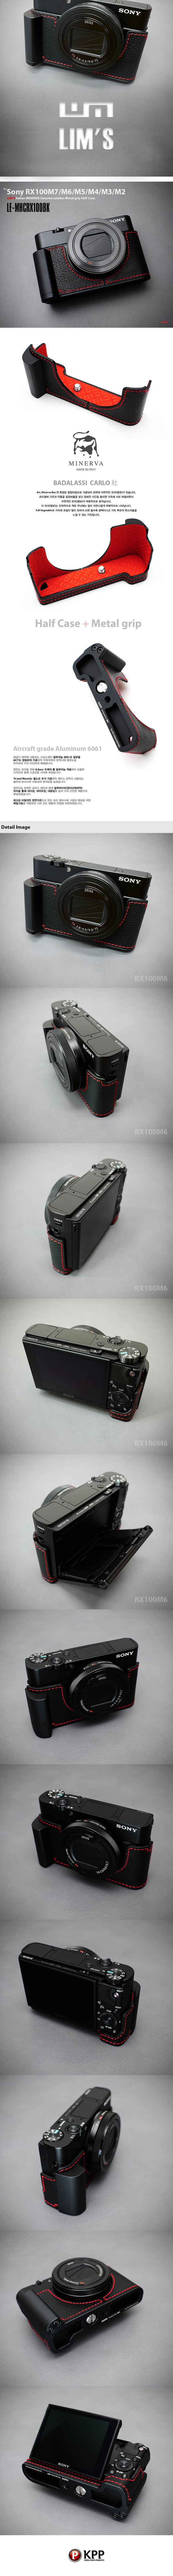 Sony_RX100M4_black.jpg